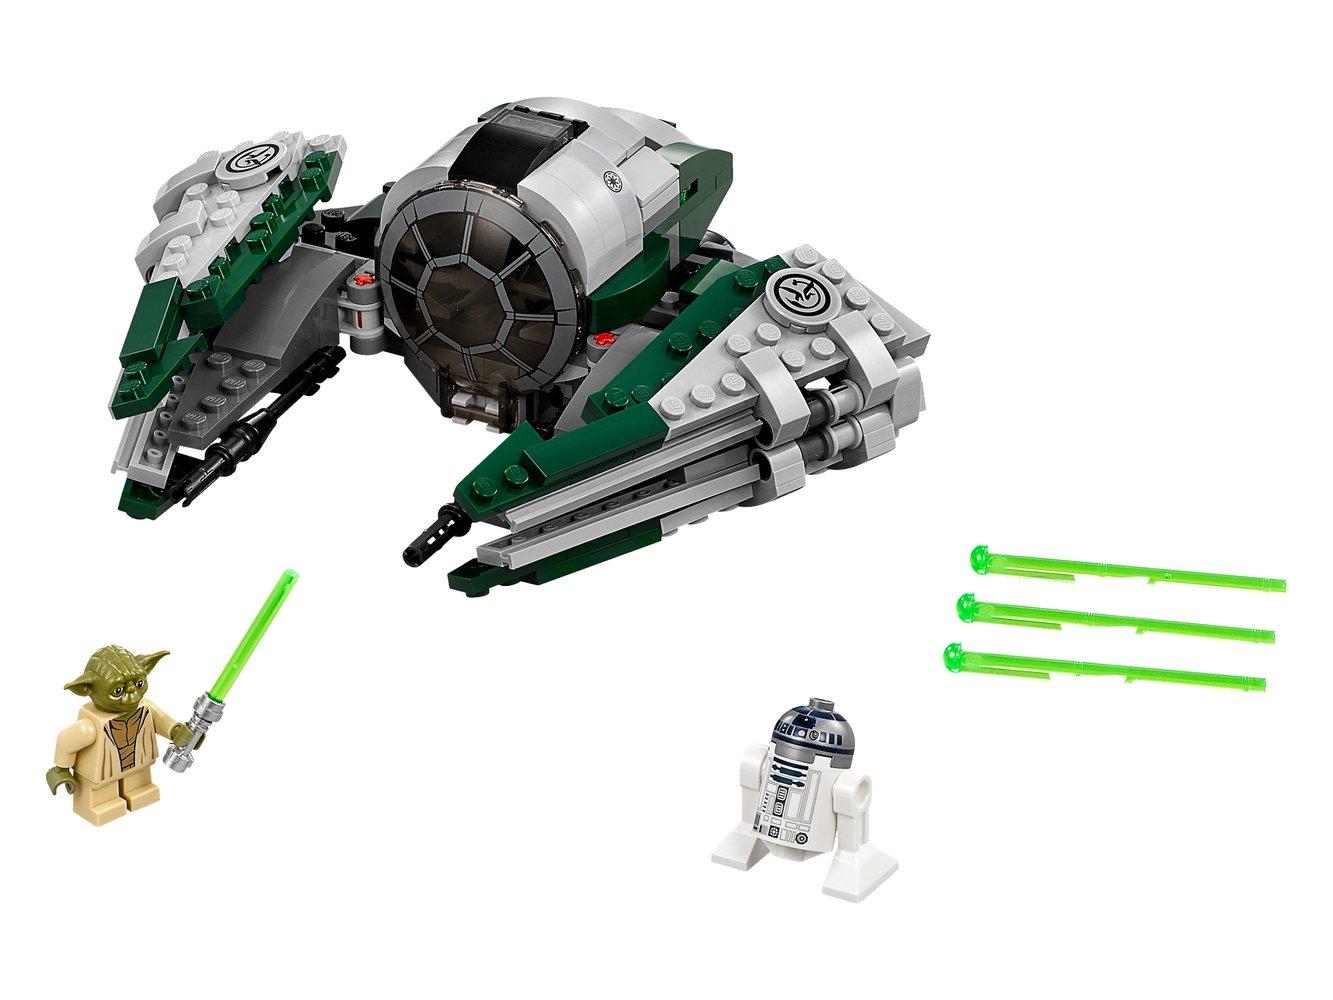 Yoda's Jedi Starfighter